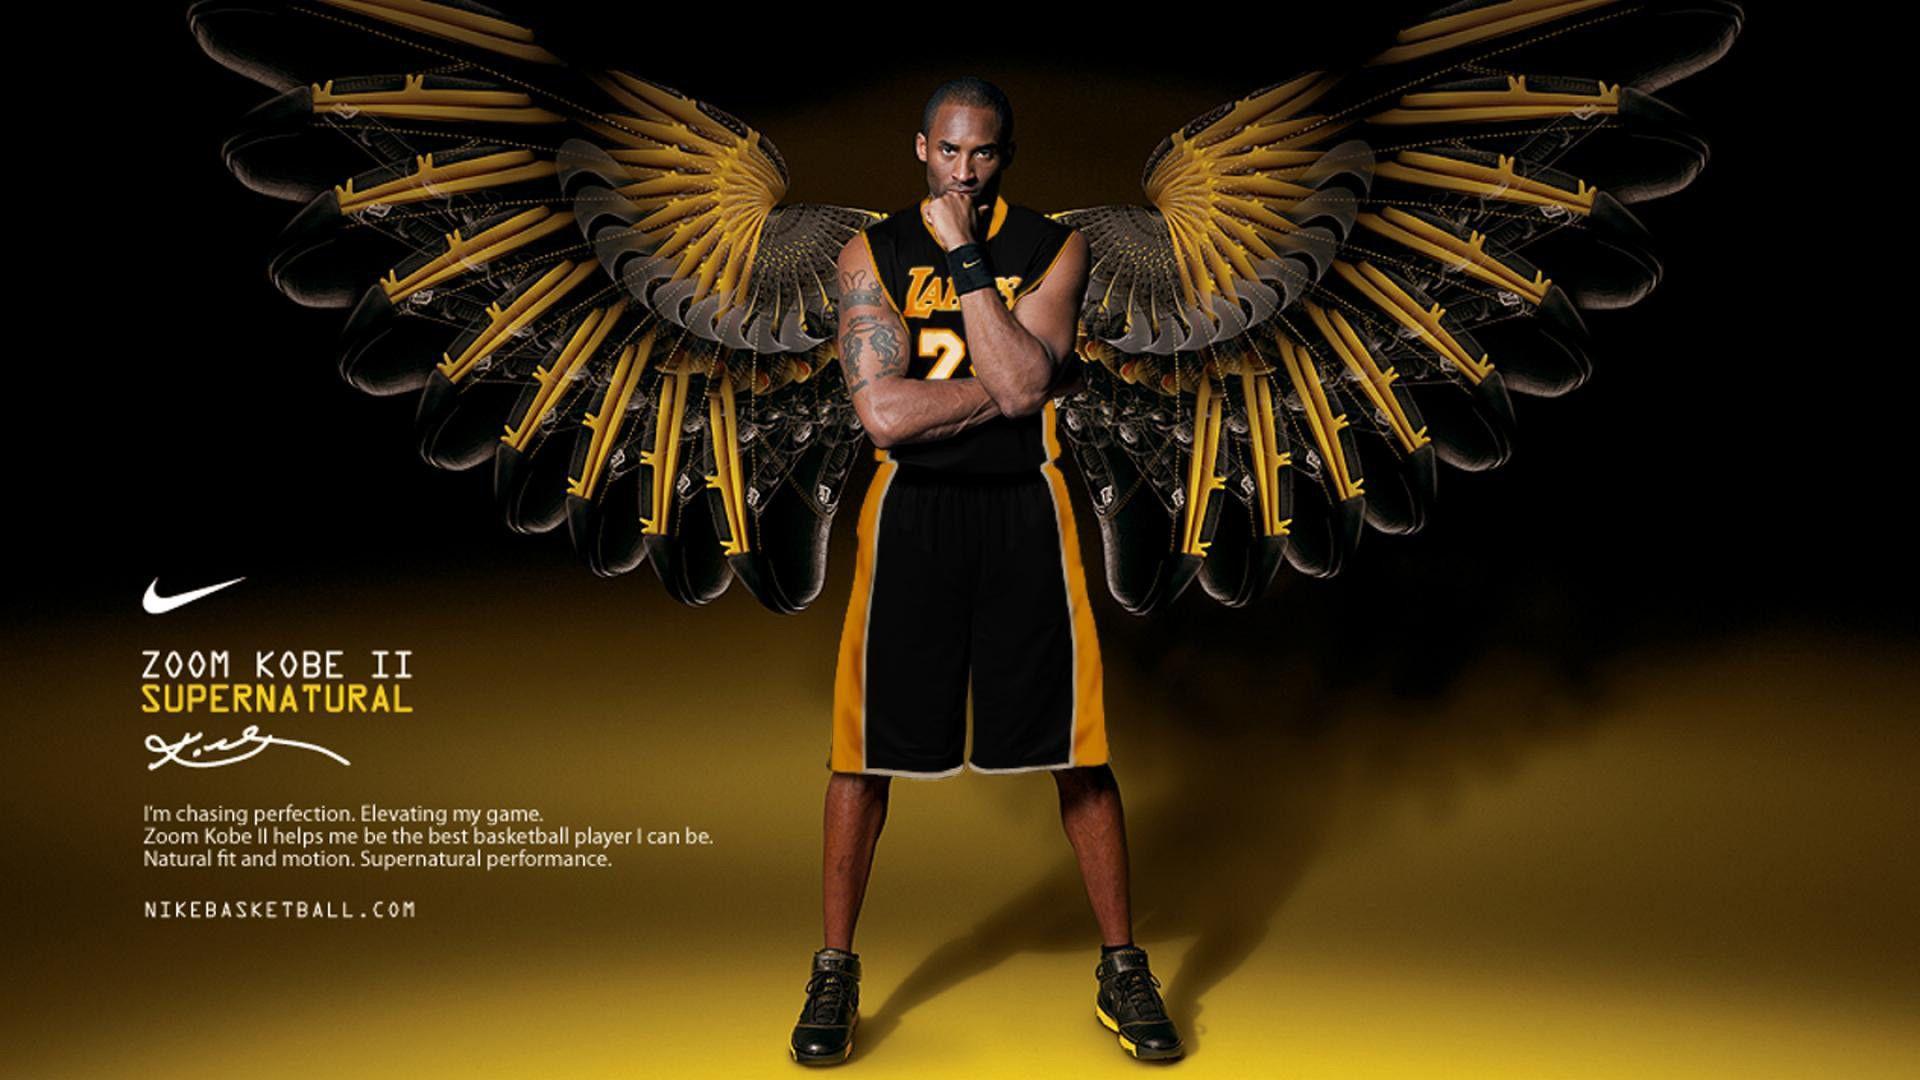 Kobe Bryant Black Mamba Wallpapers Top Free Kobe Bryant Black Mamba Backgrounds Wallpaperaccess